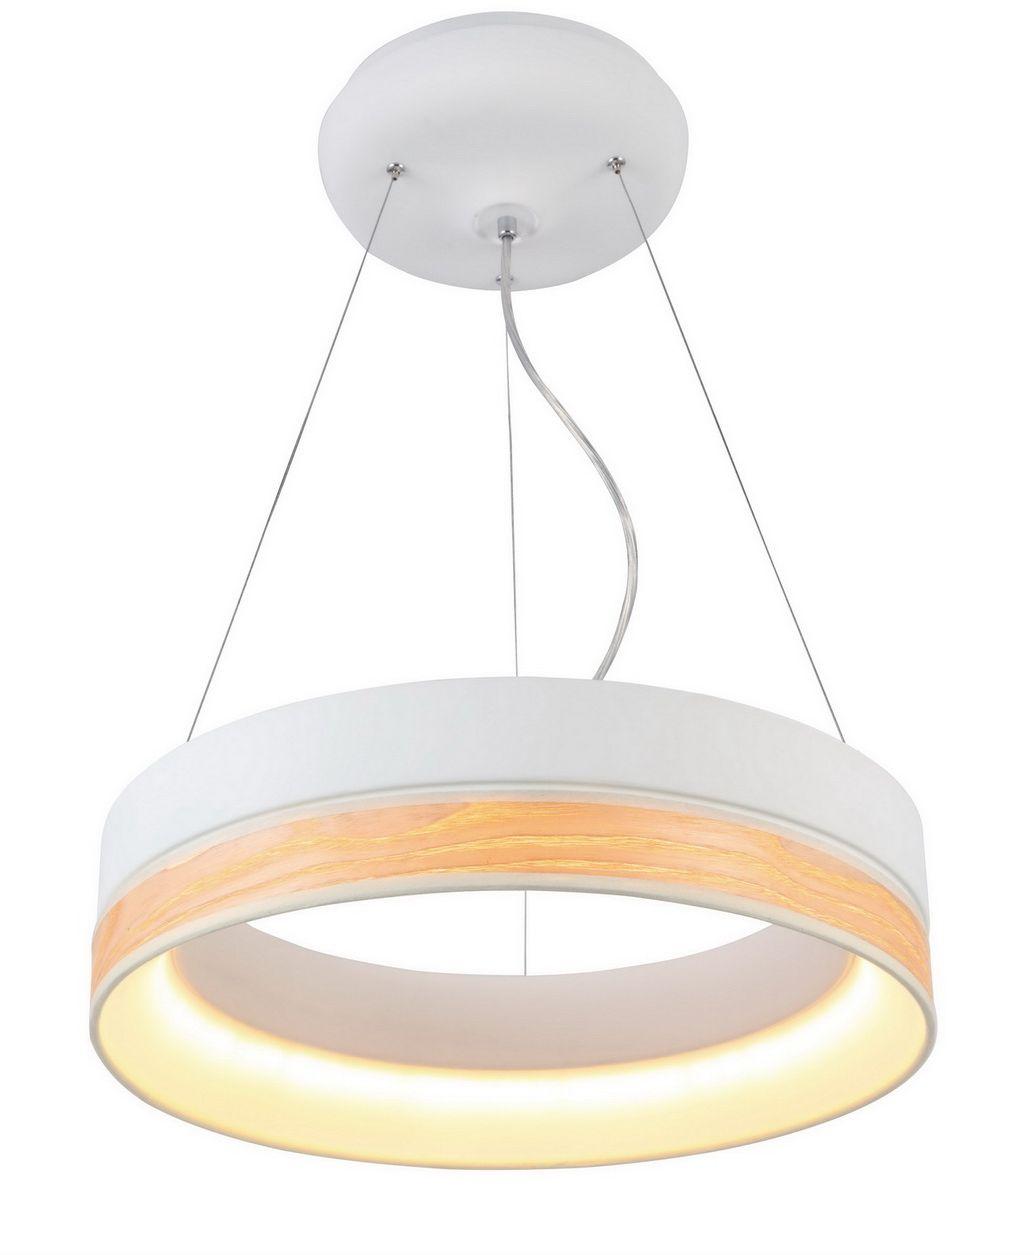 Светильник подвесной Favourite Ledino, 1 х LED, 43. 1357-120P1357-120P